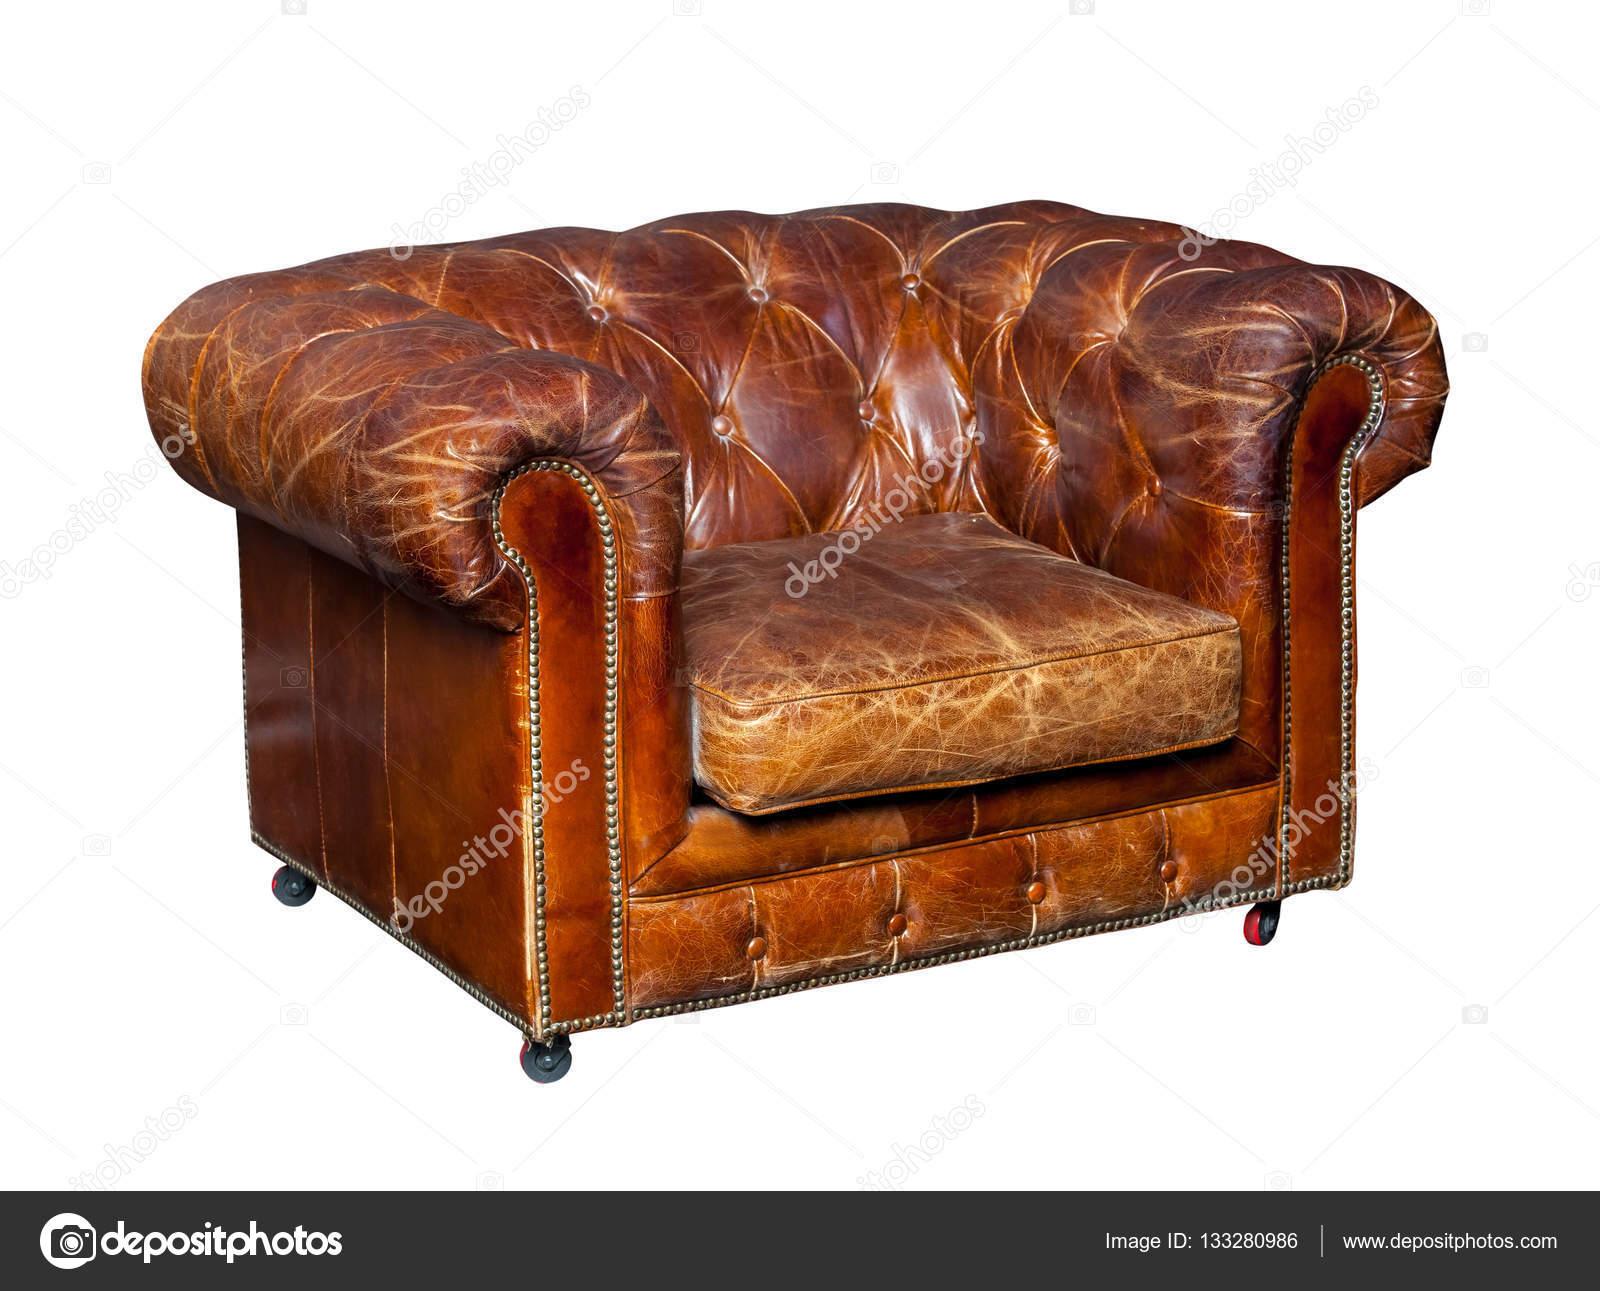 Bruine Leren Stoel : Klassieke bruin lederen stoel u2014 stockfoto © prescott10 #133280986